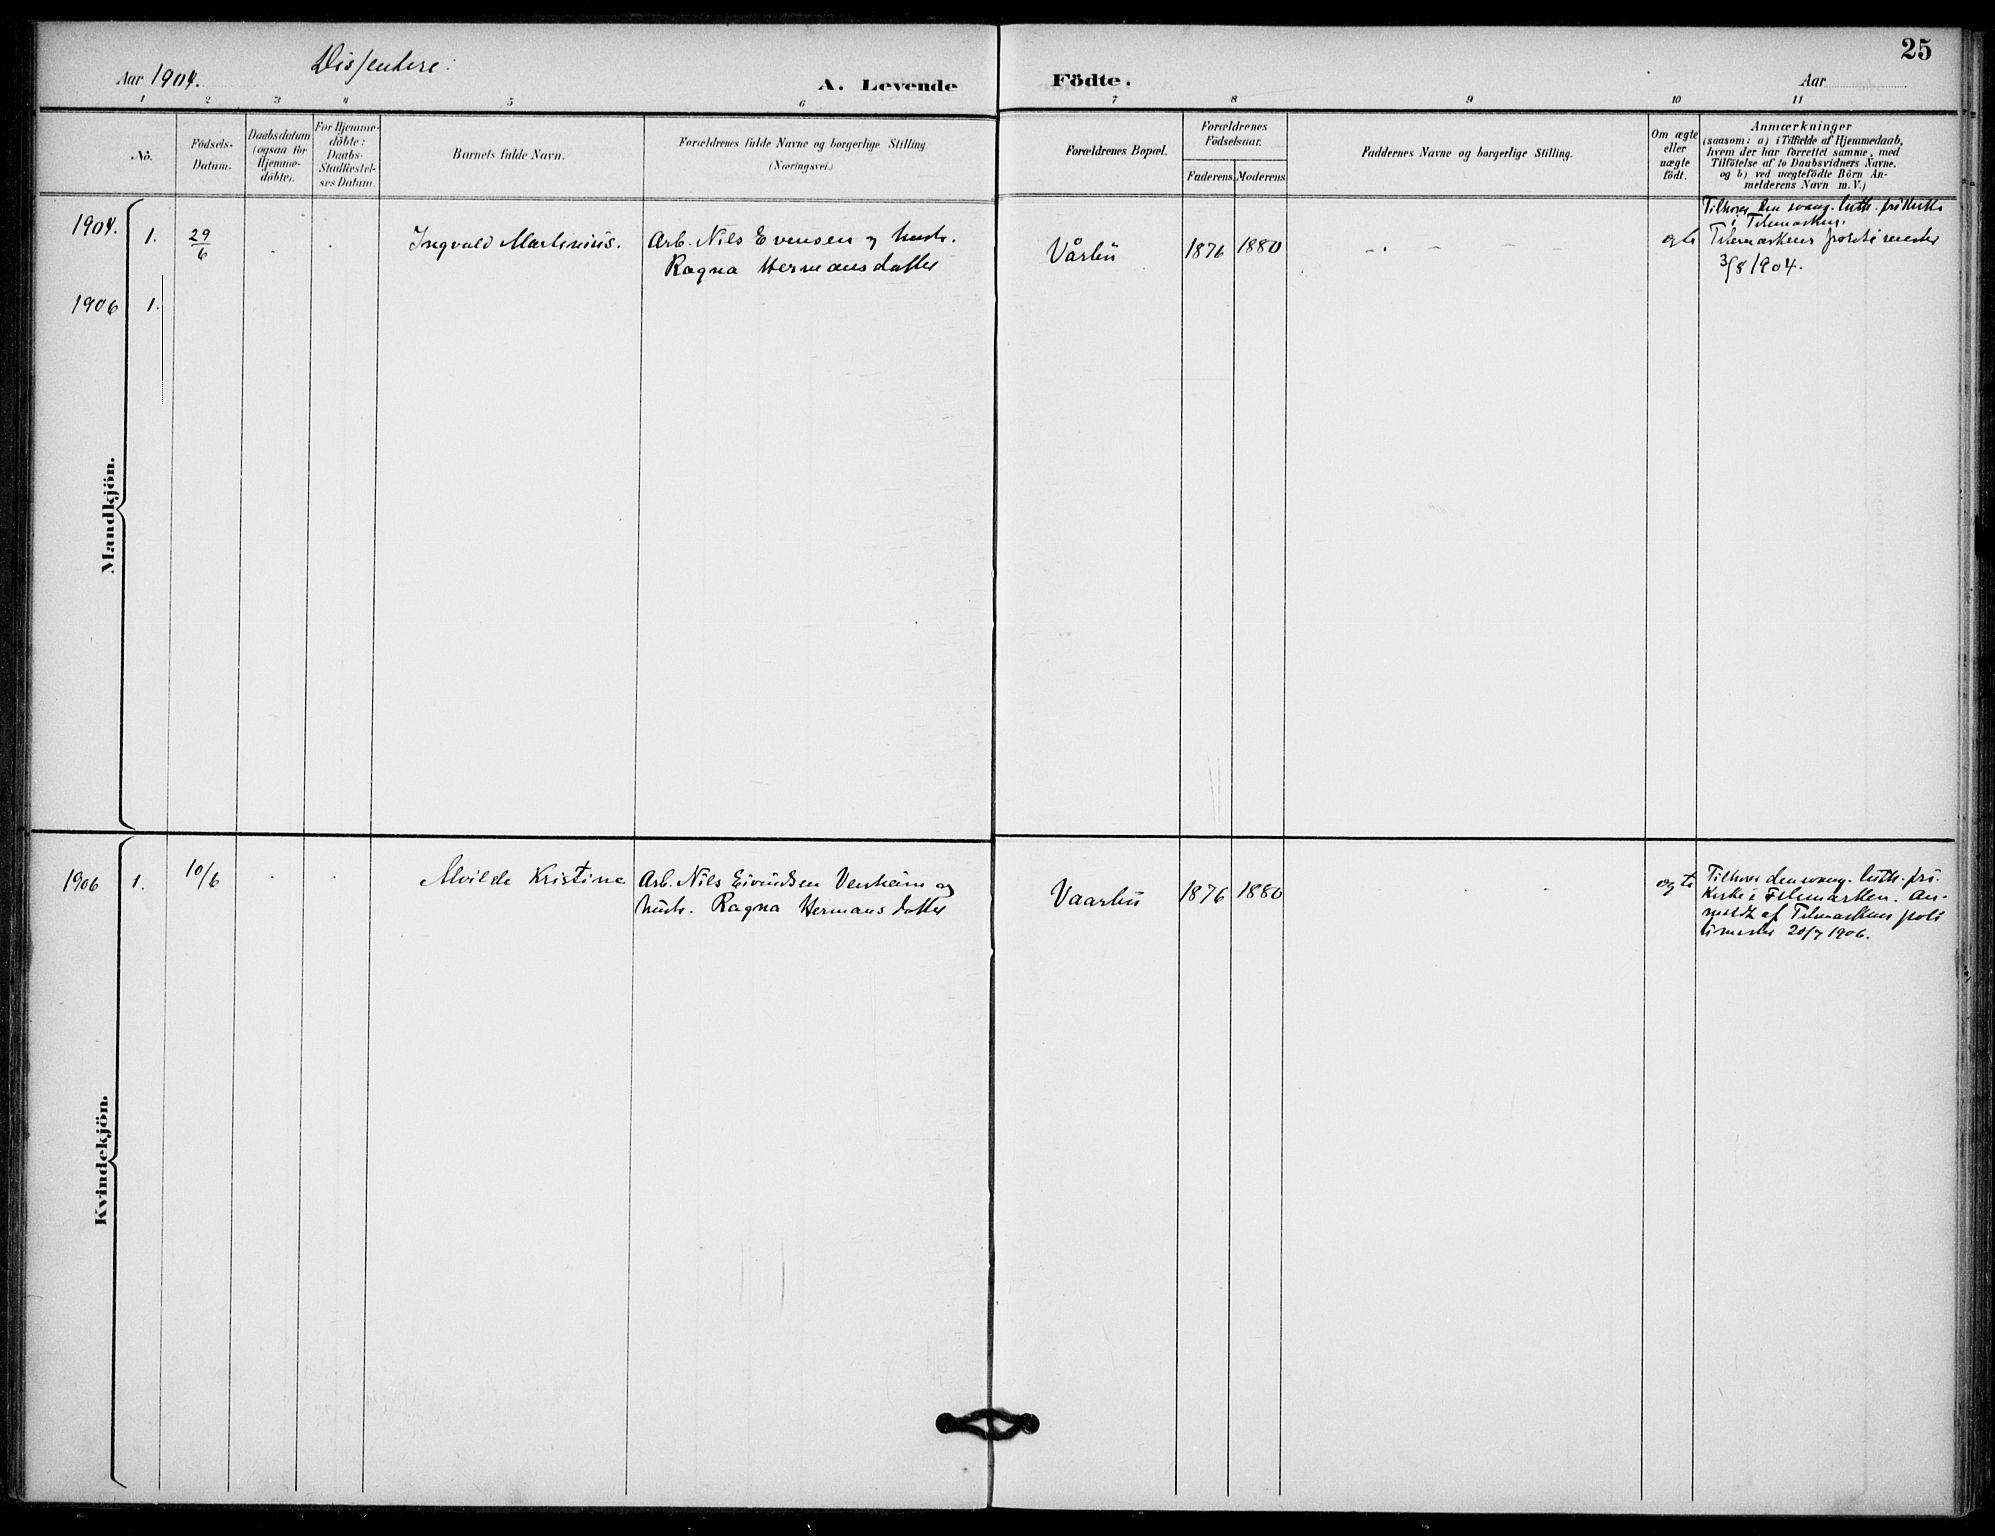 SAKO, Lunde kirkebøker, F/Fb/L0004: Ministerialbok nr. II 4, 1892-1907, s. 25